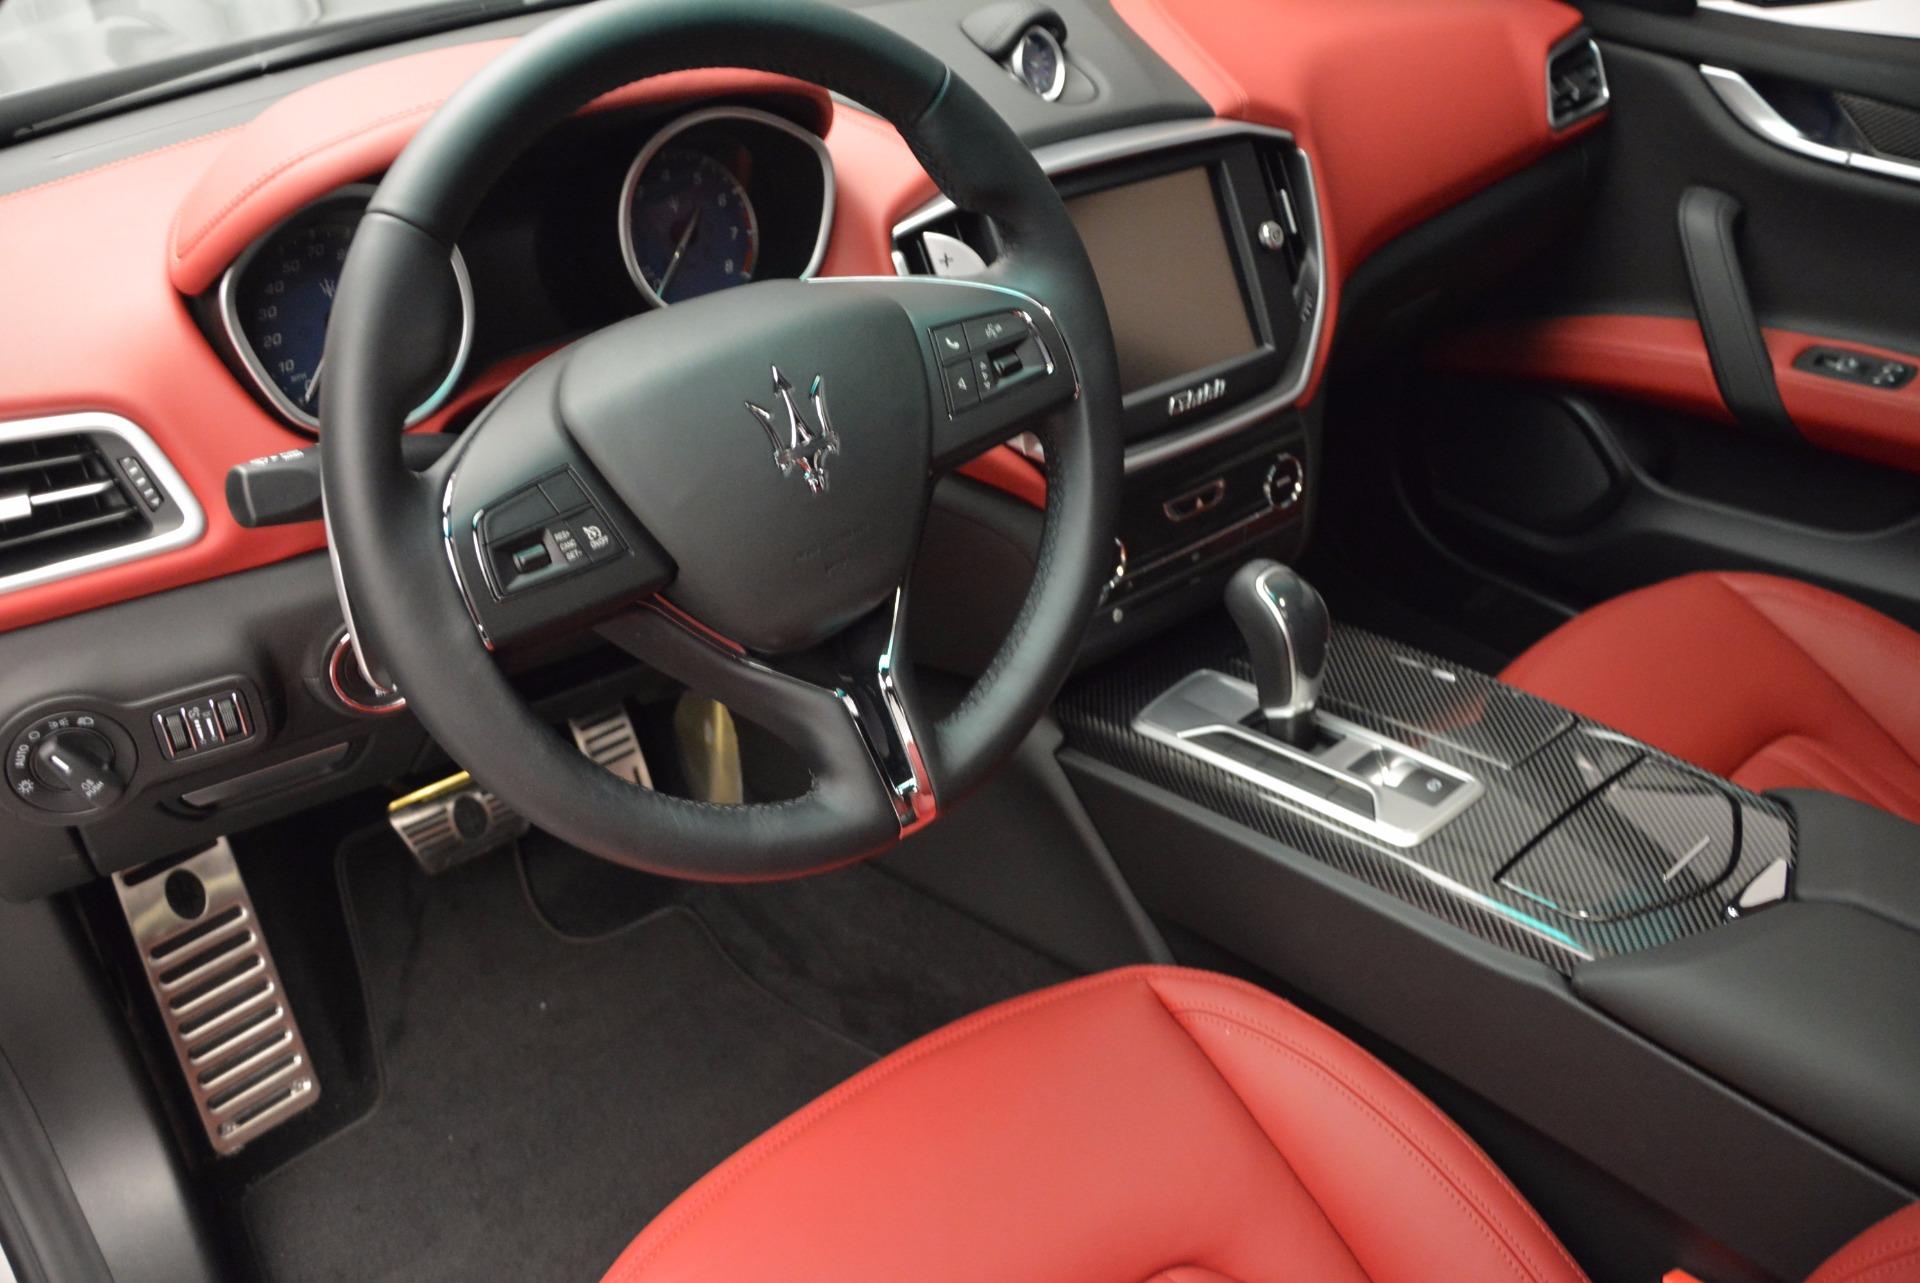 Used 2015 Maserati Ghibli S Q4 For Sale In Westport, CT 1290_p13